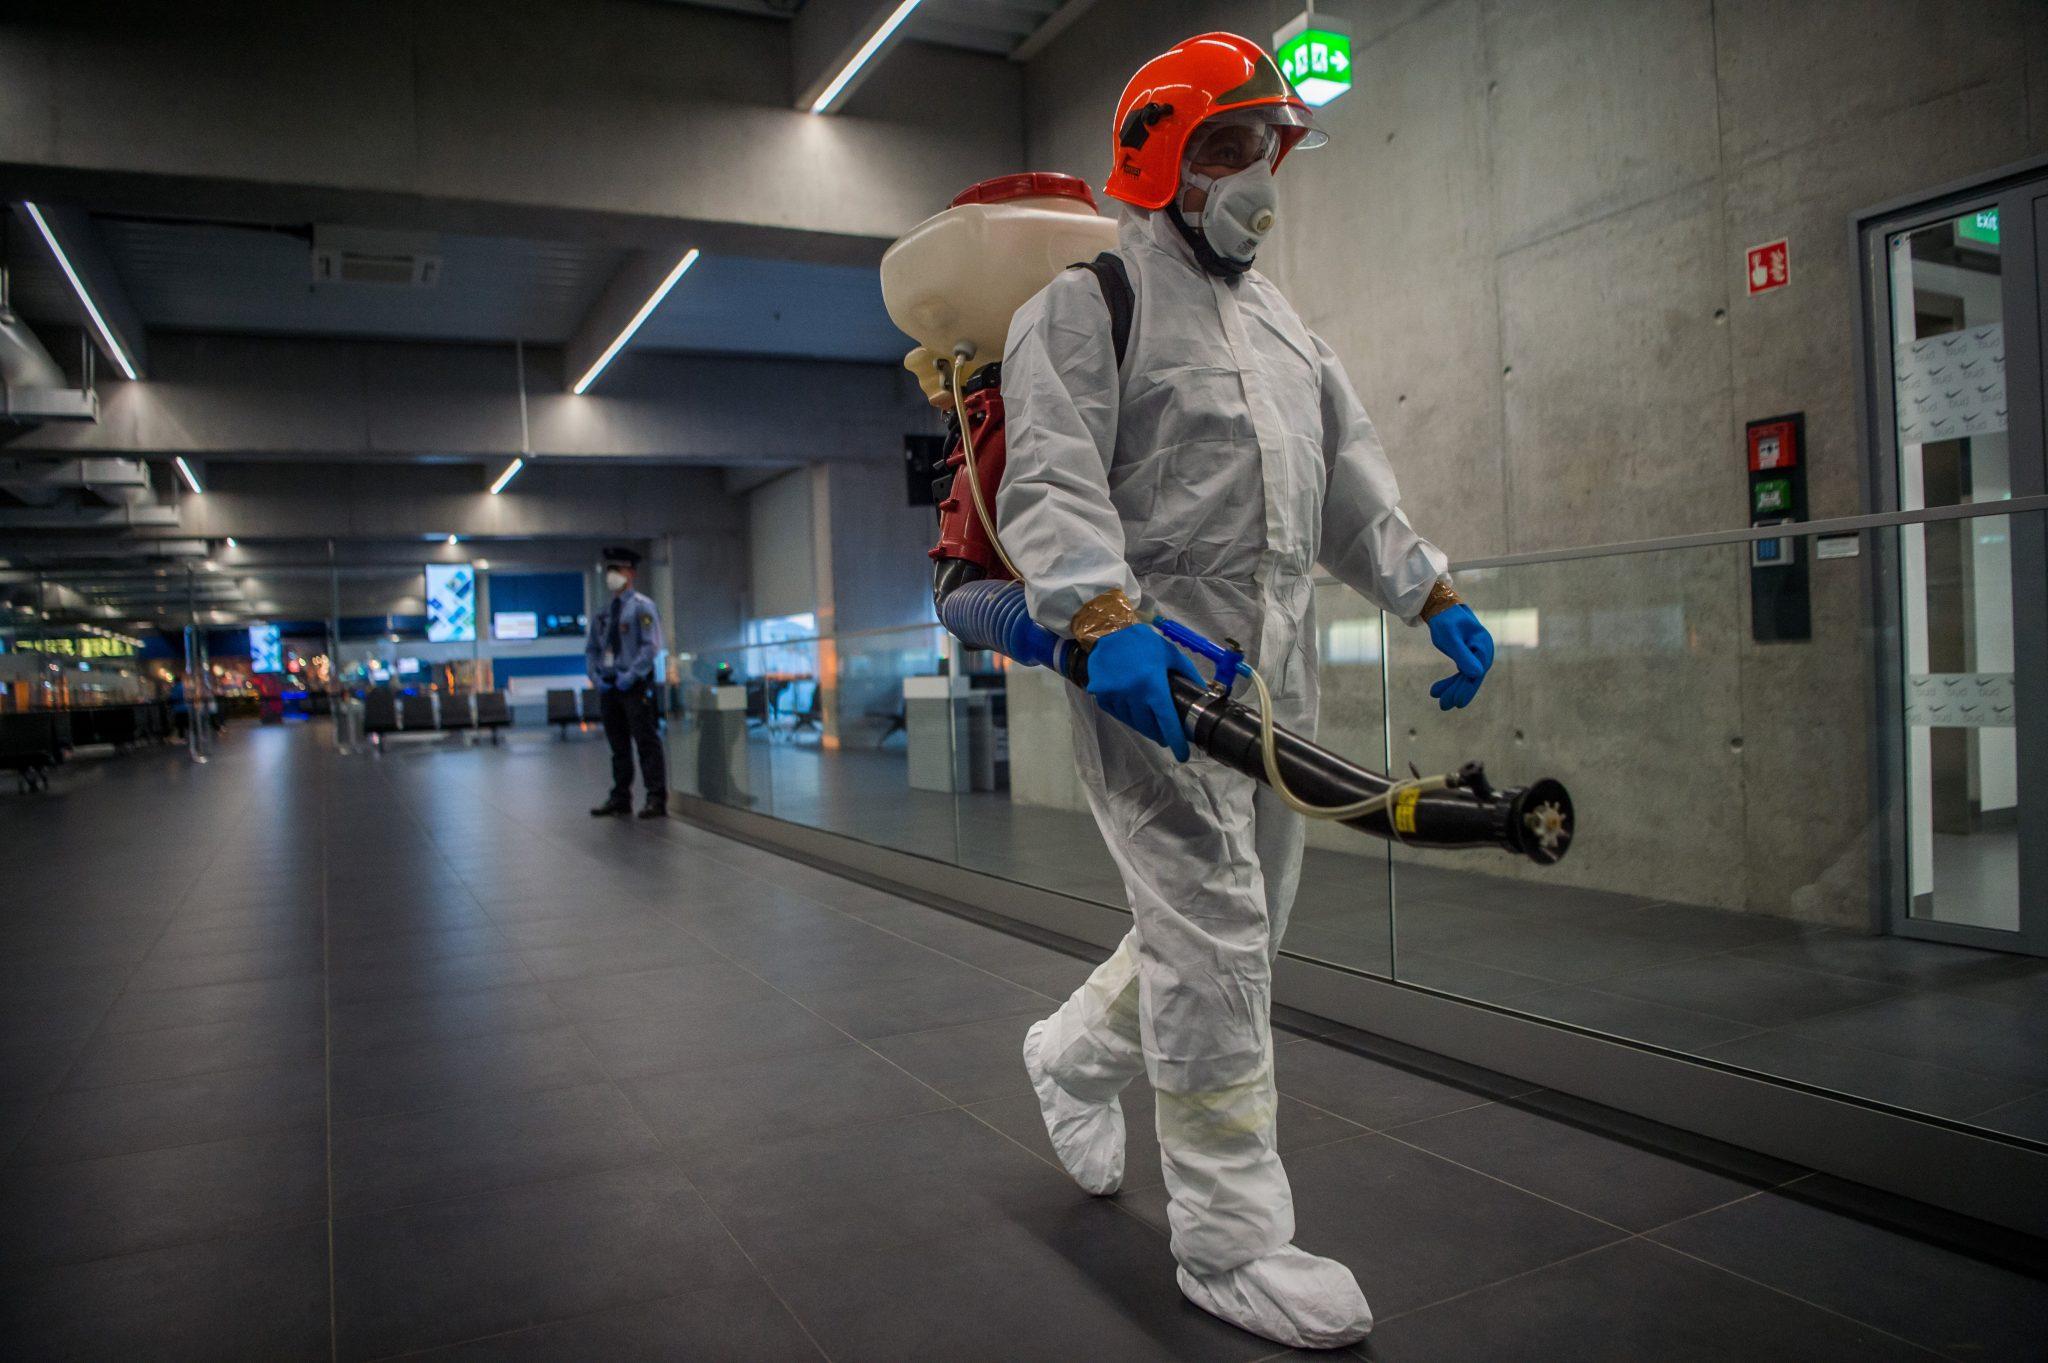 Coronavirus: Nearly 900 Passengers Screened at Budapest Airport So Far post's picture